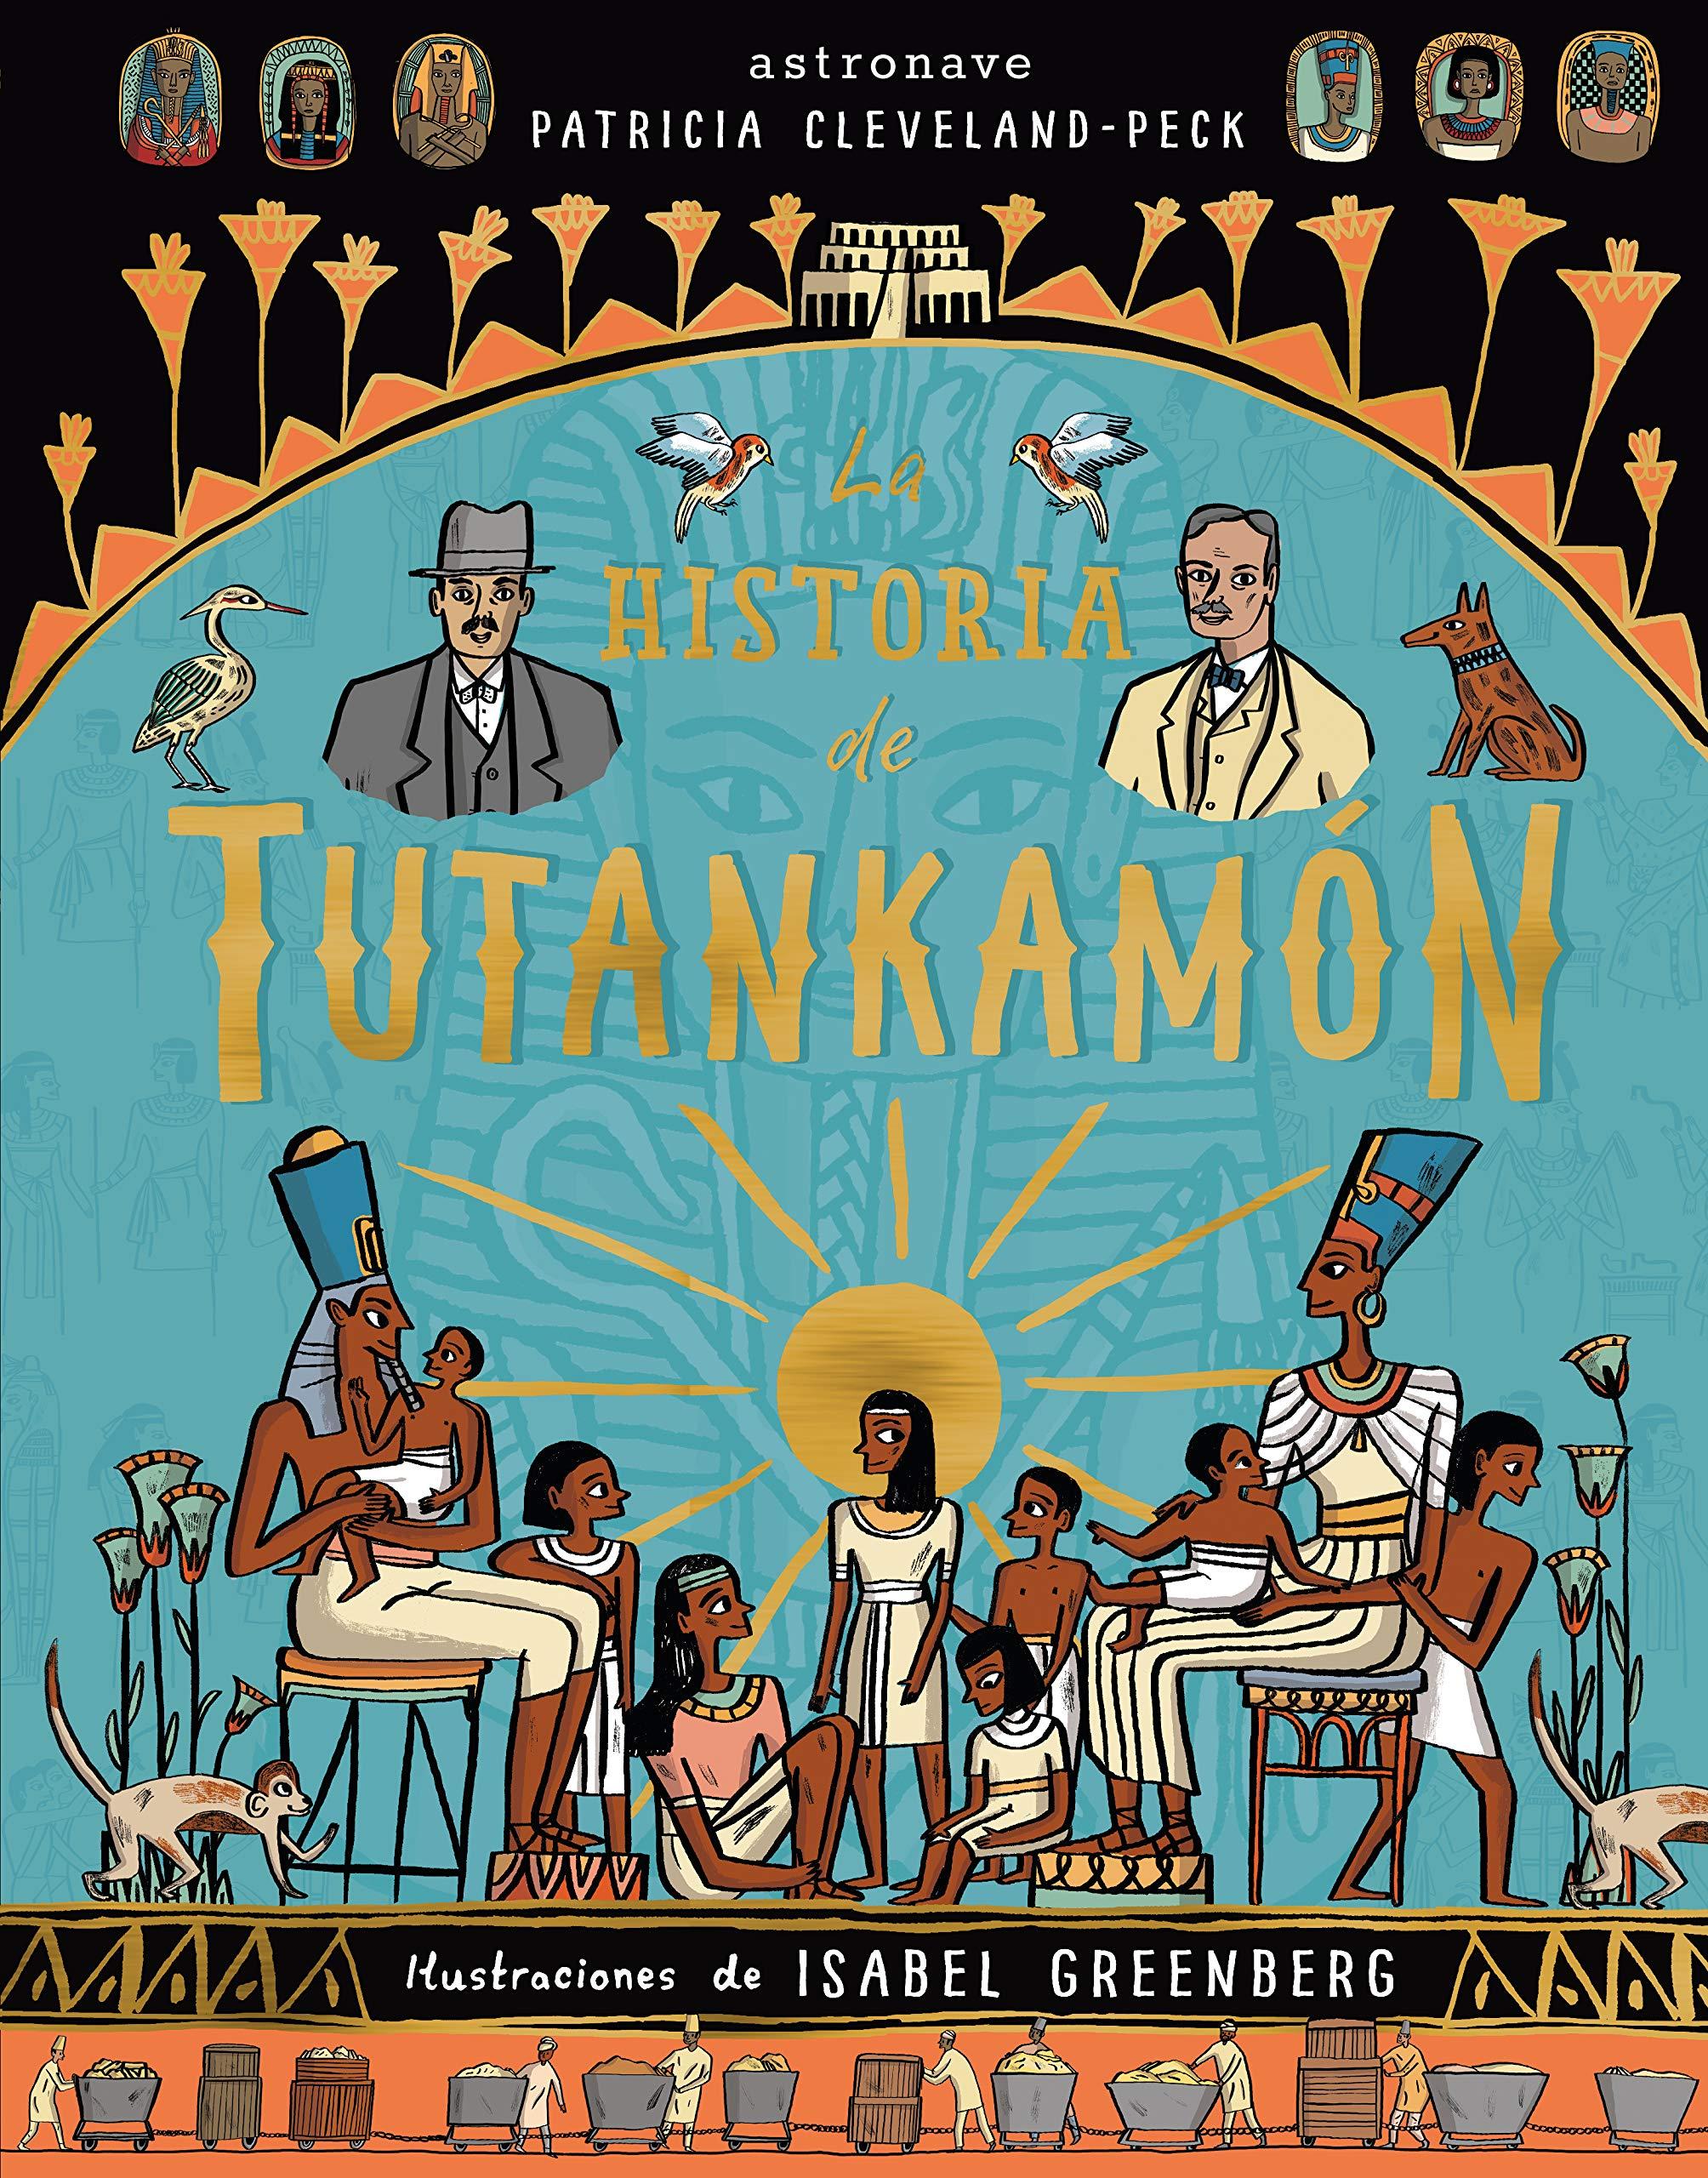 LA HISTORIA DE TUTANKHAMON: Amazon.es: Patricia Cleveland-Peck, Isabel Greenberg, Astronave: Libros